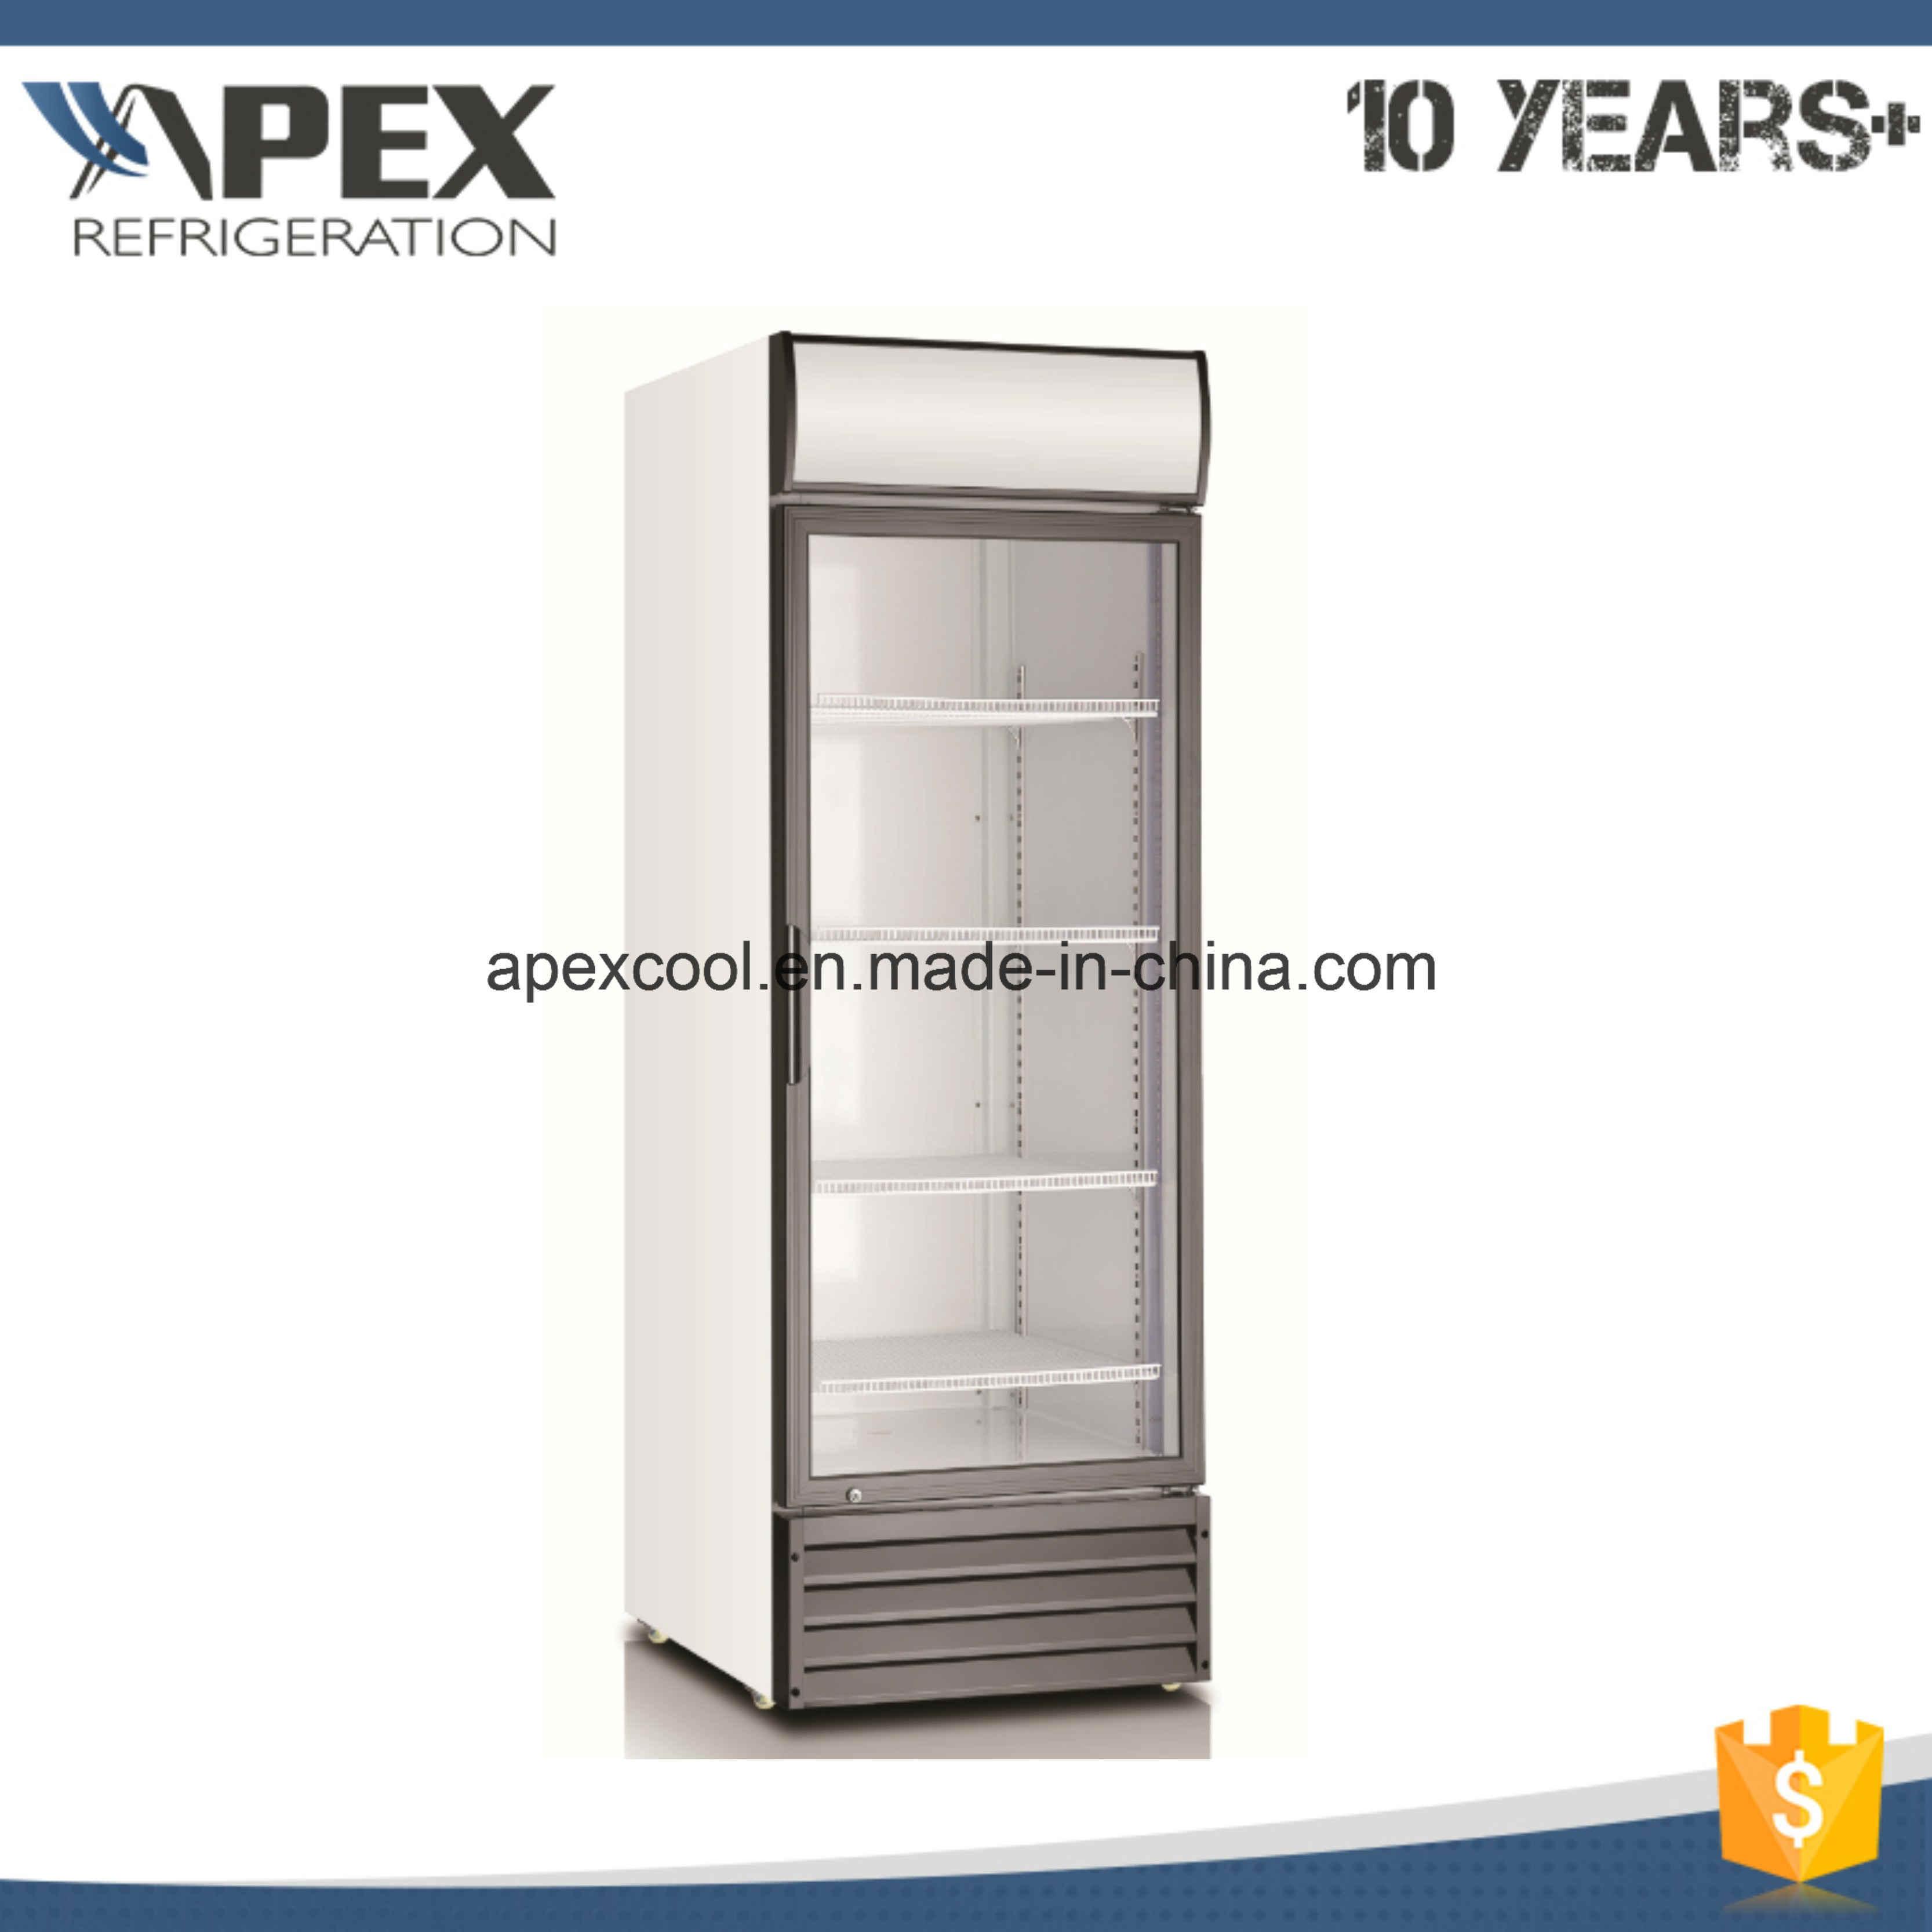 refrigeration ge for integrated in or built installation dual drawer refrigerators single bottom frtebcditjol customizable refrigerator monogram freezer